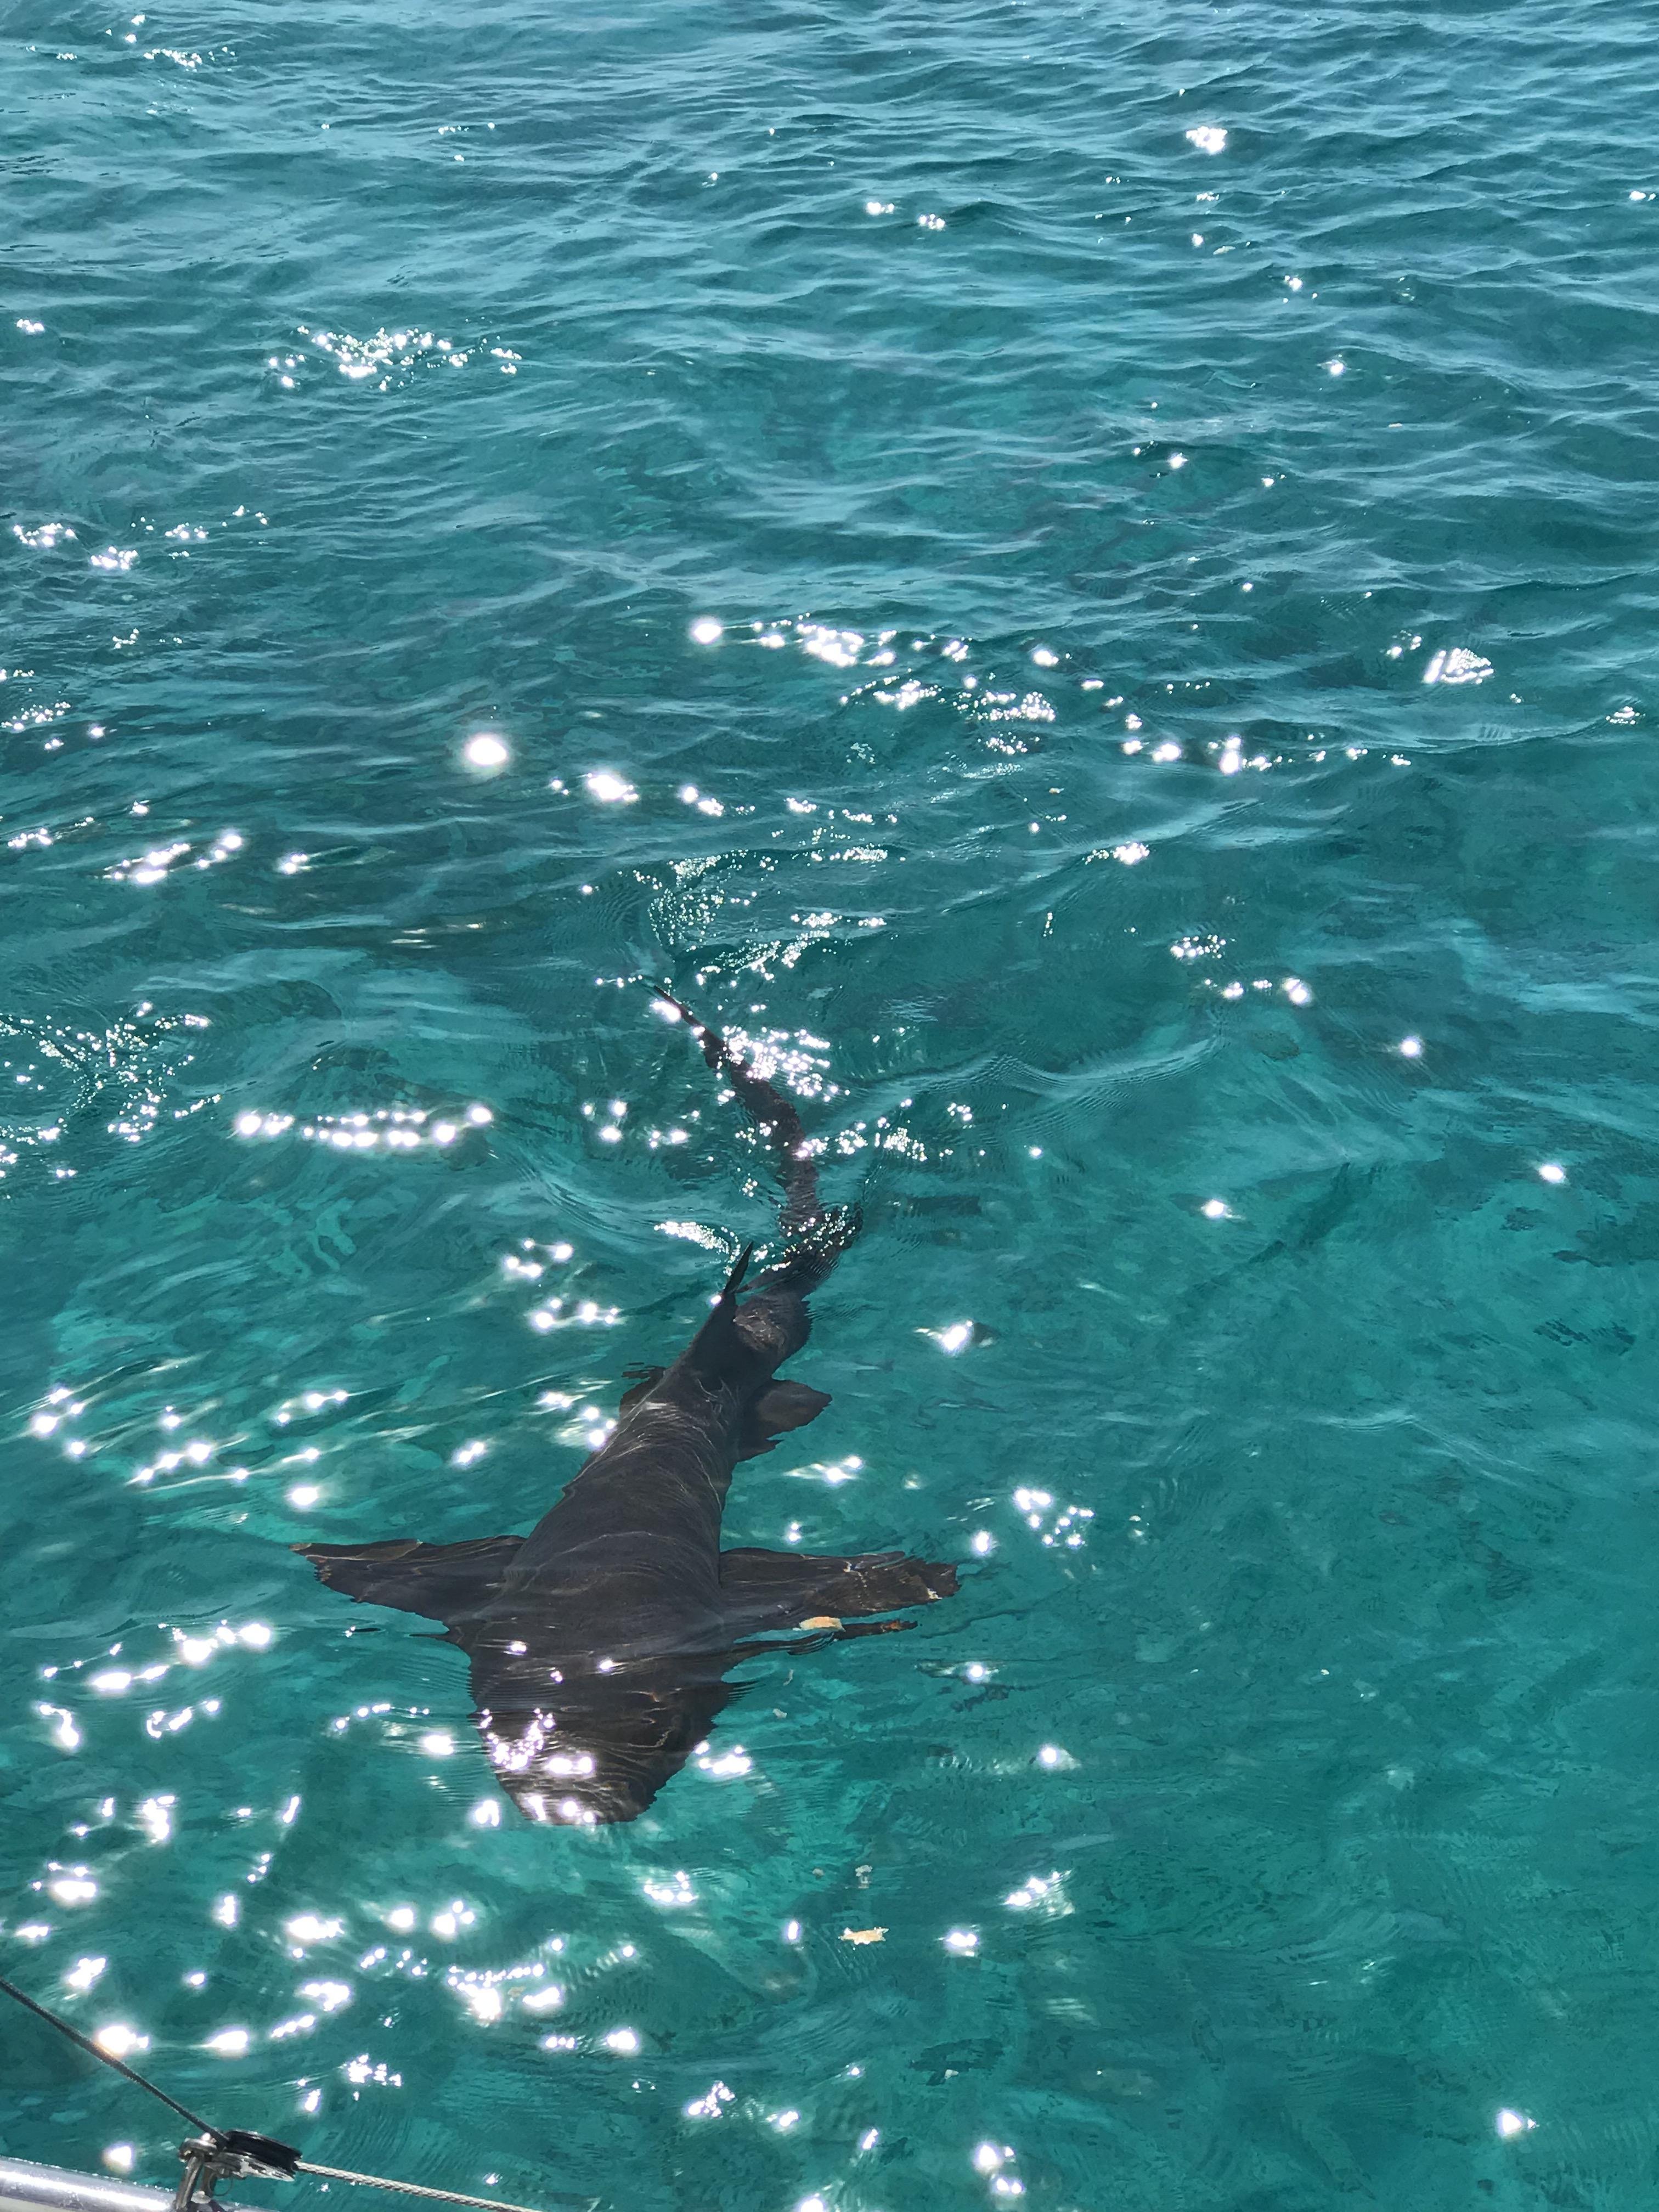 Alquiler-barco-Caribe-yate-motor-velero-catamaran-turismo-vacaciones-Bahamas-tiburon